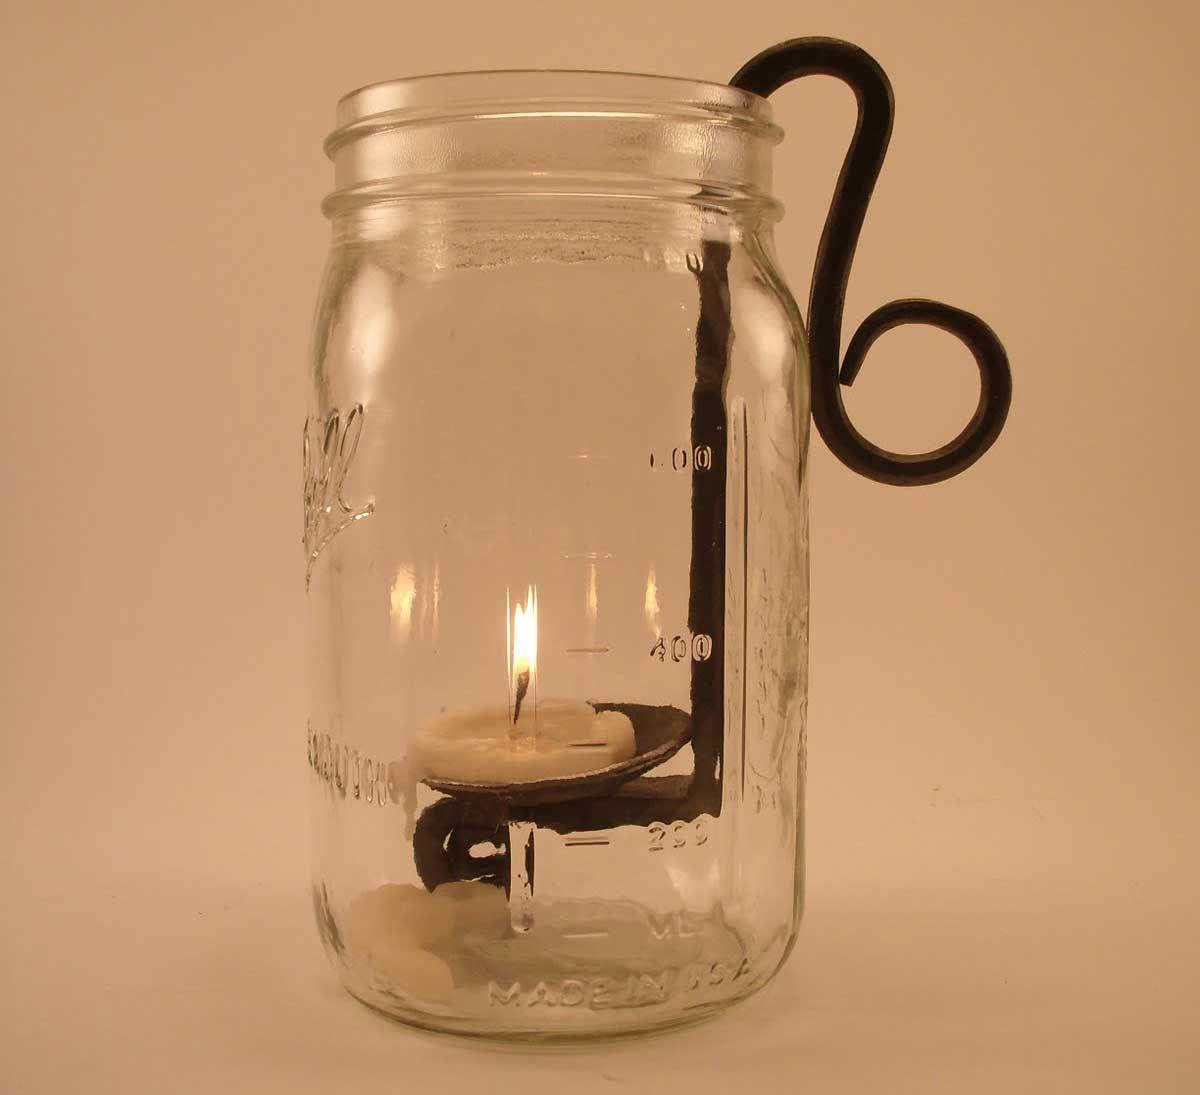 General Mason Jar Candle Holders Part Explanation